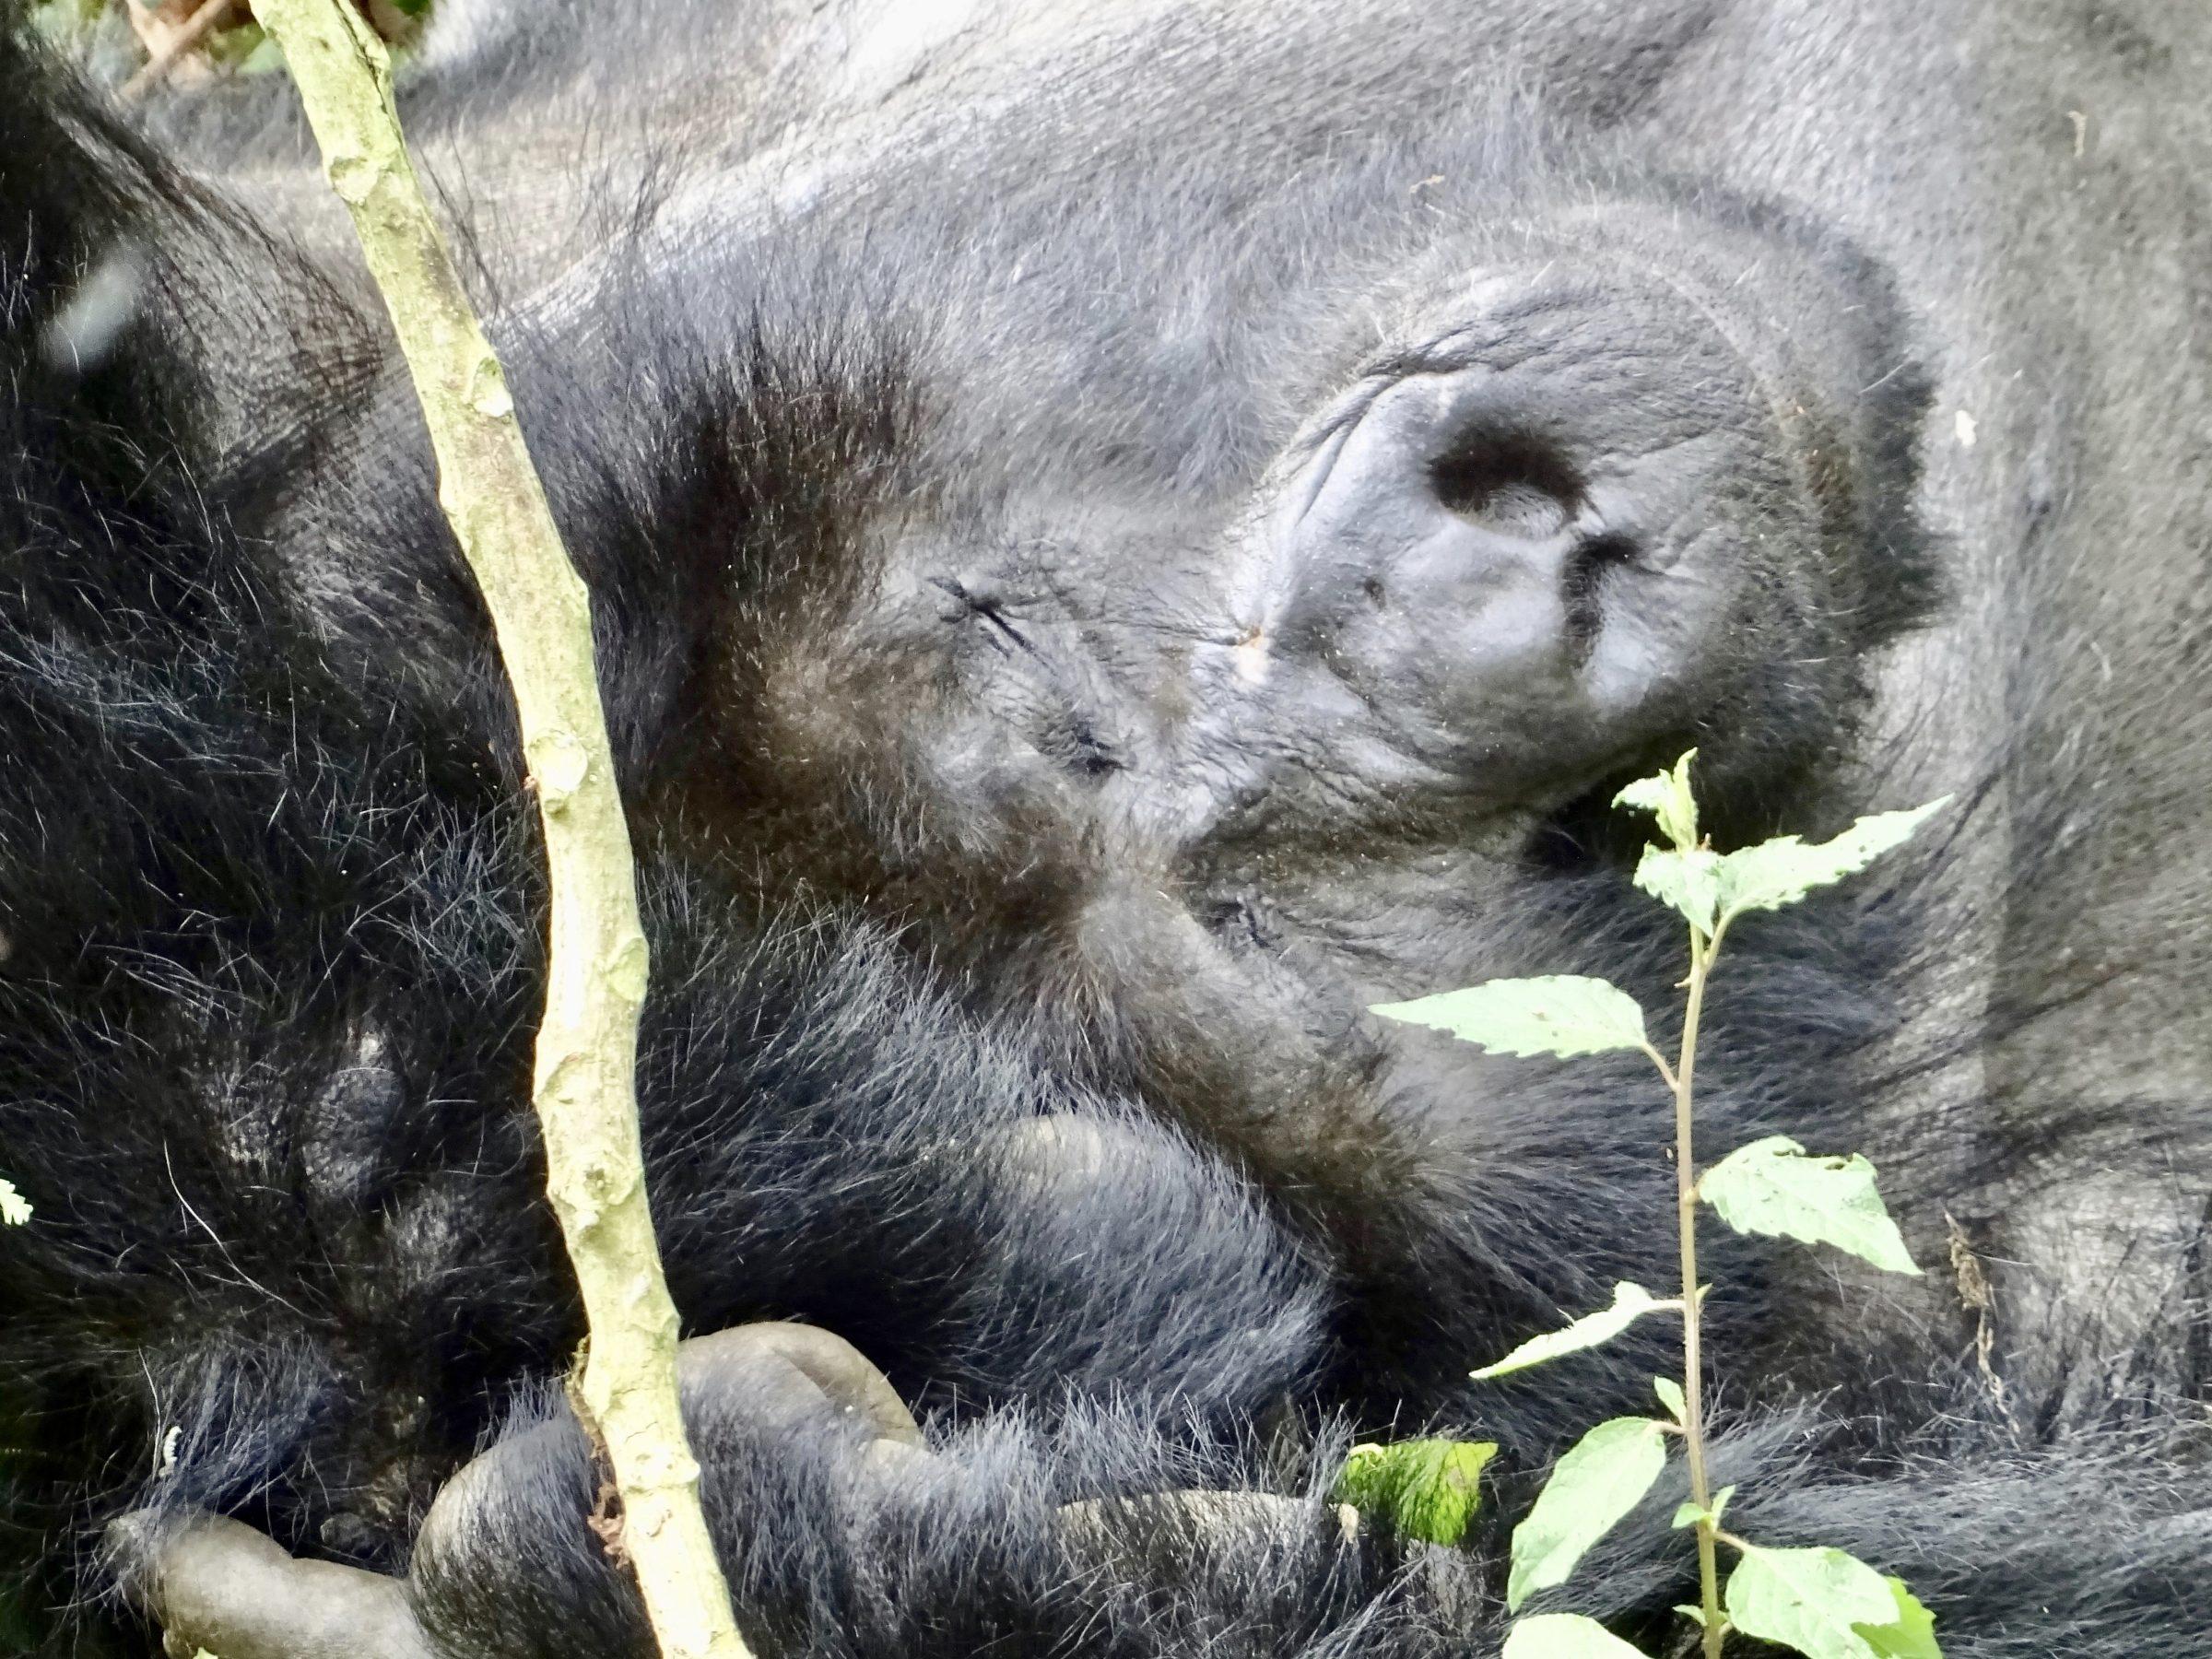 Een slapende berggorilla in Bwindi